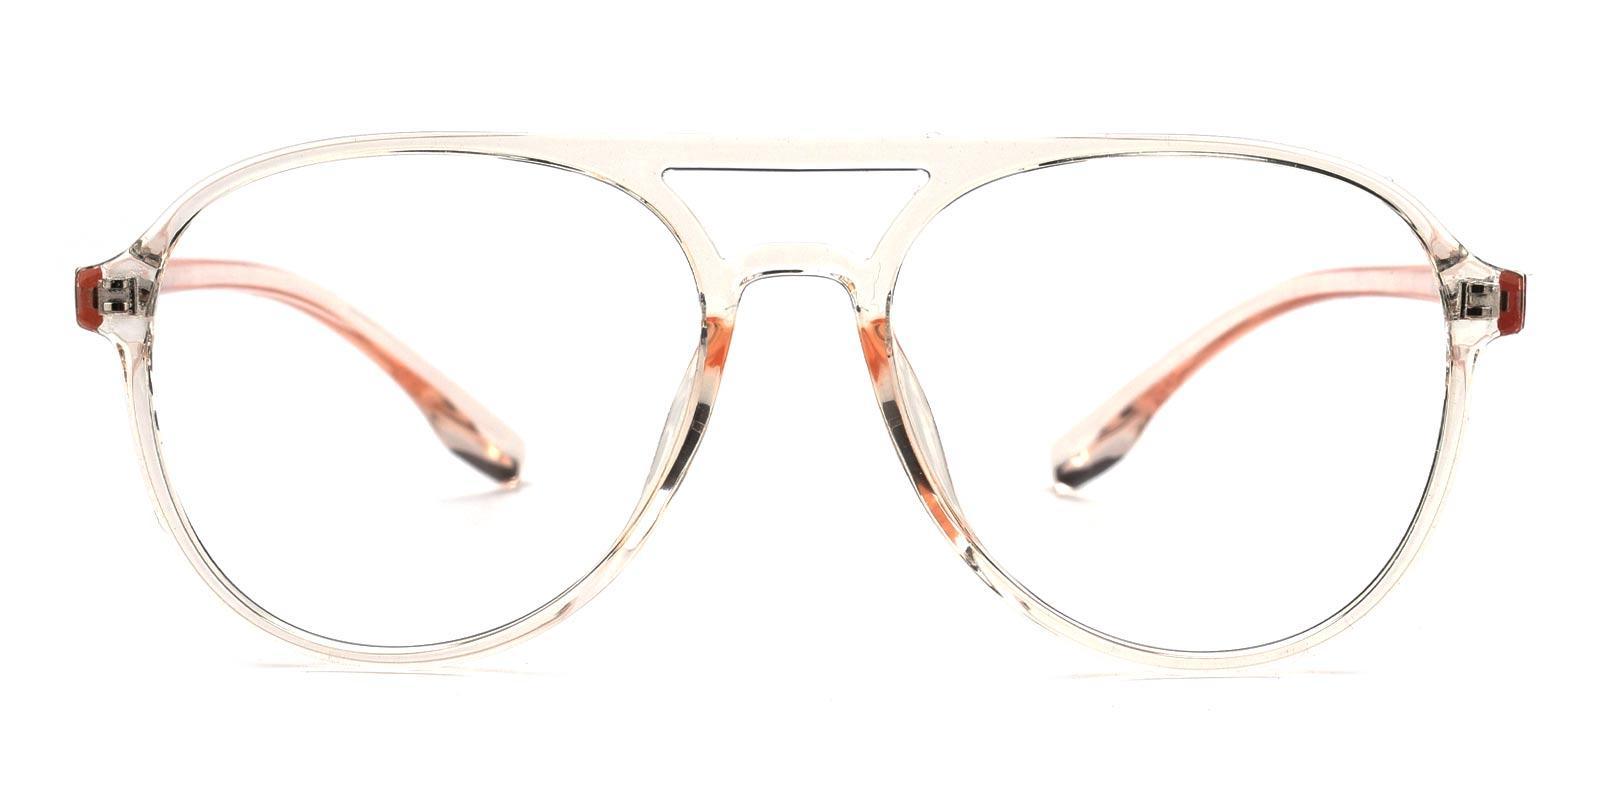 Mitchell-Orange-Aviator-TR-Eyeglasses-detail